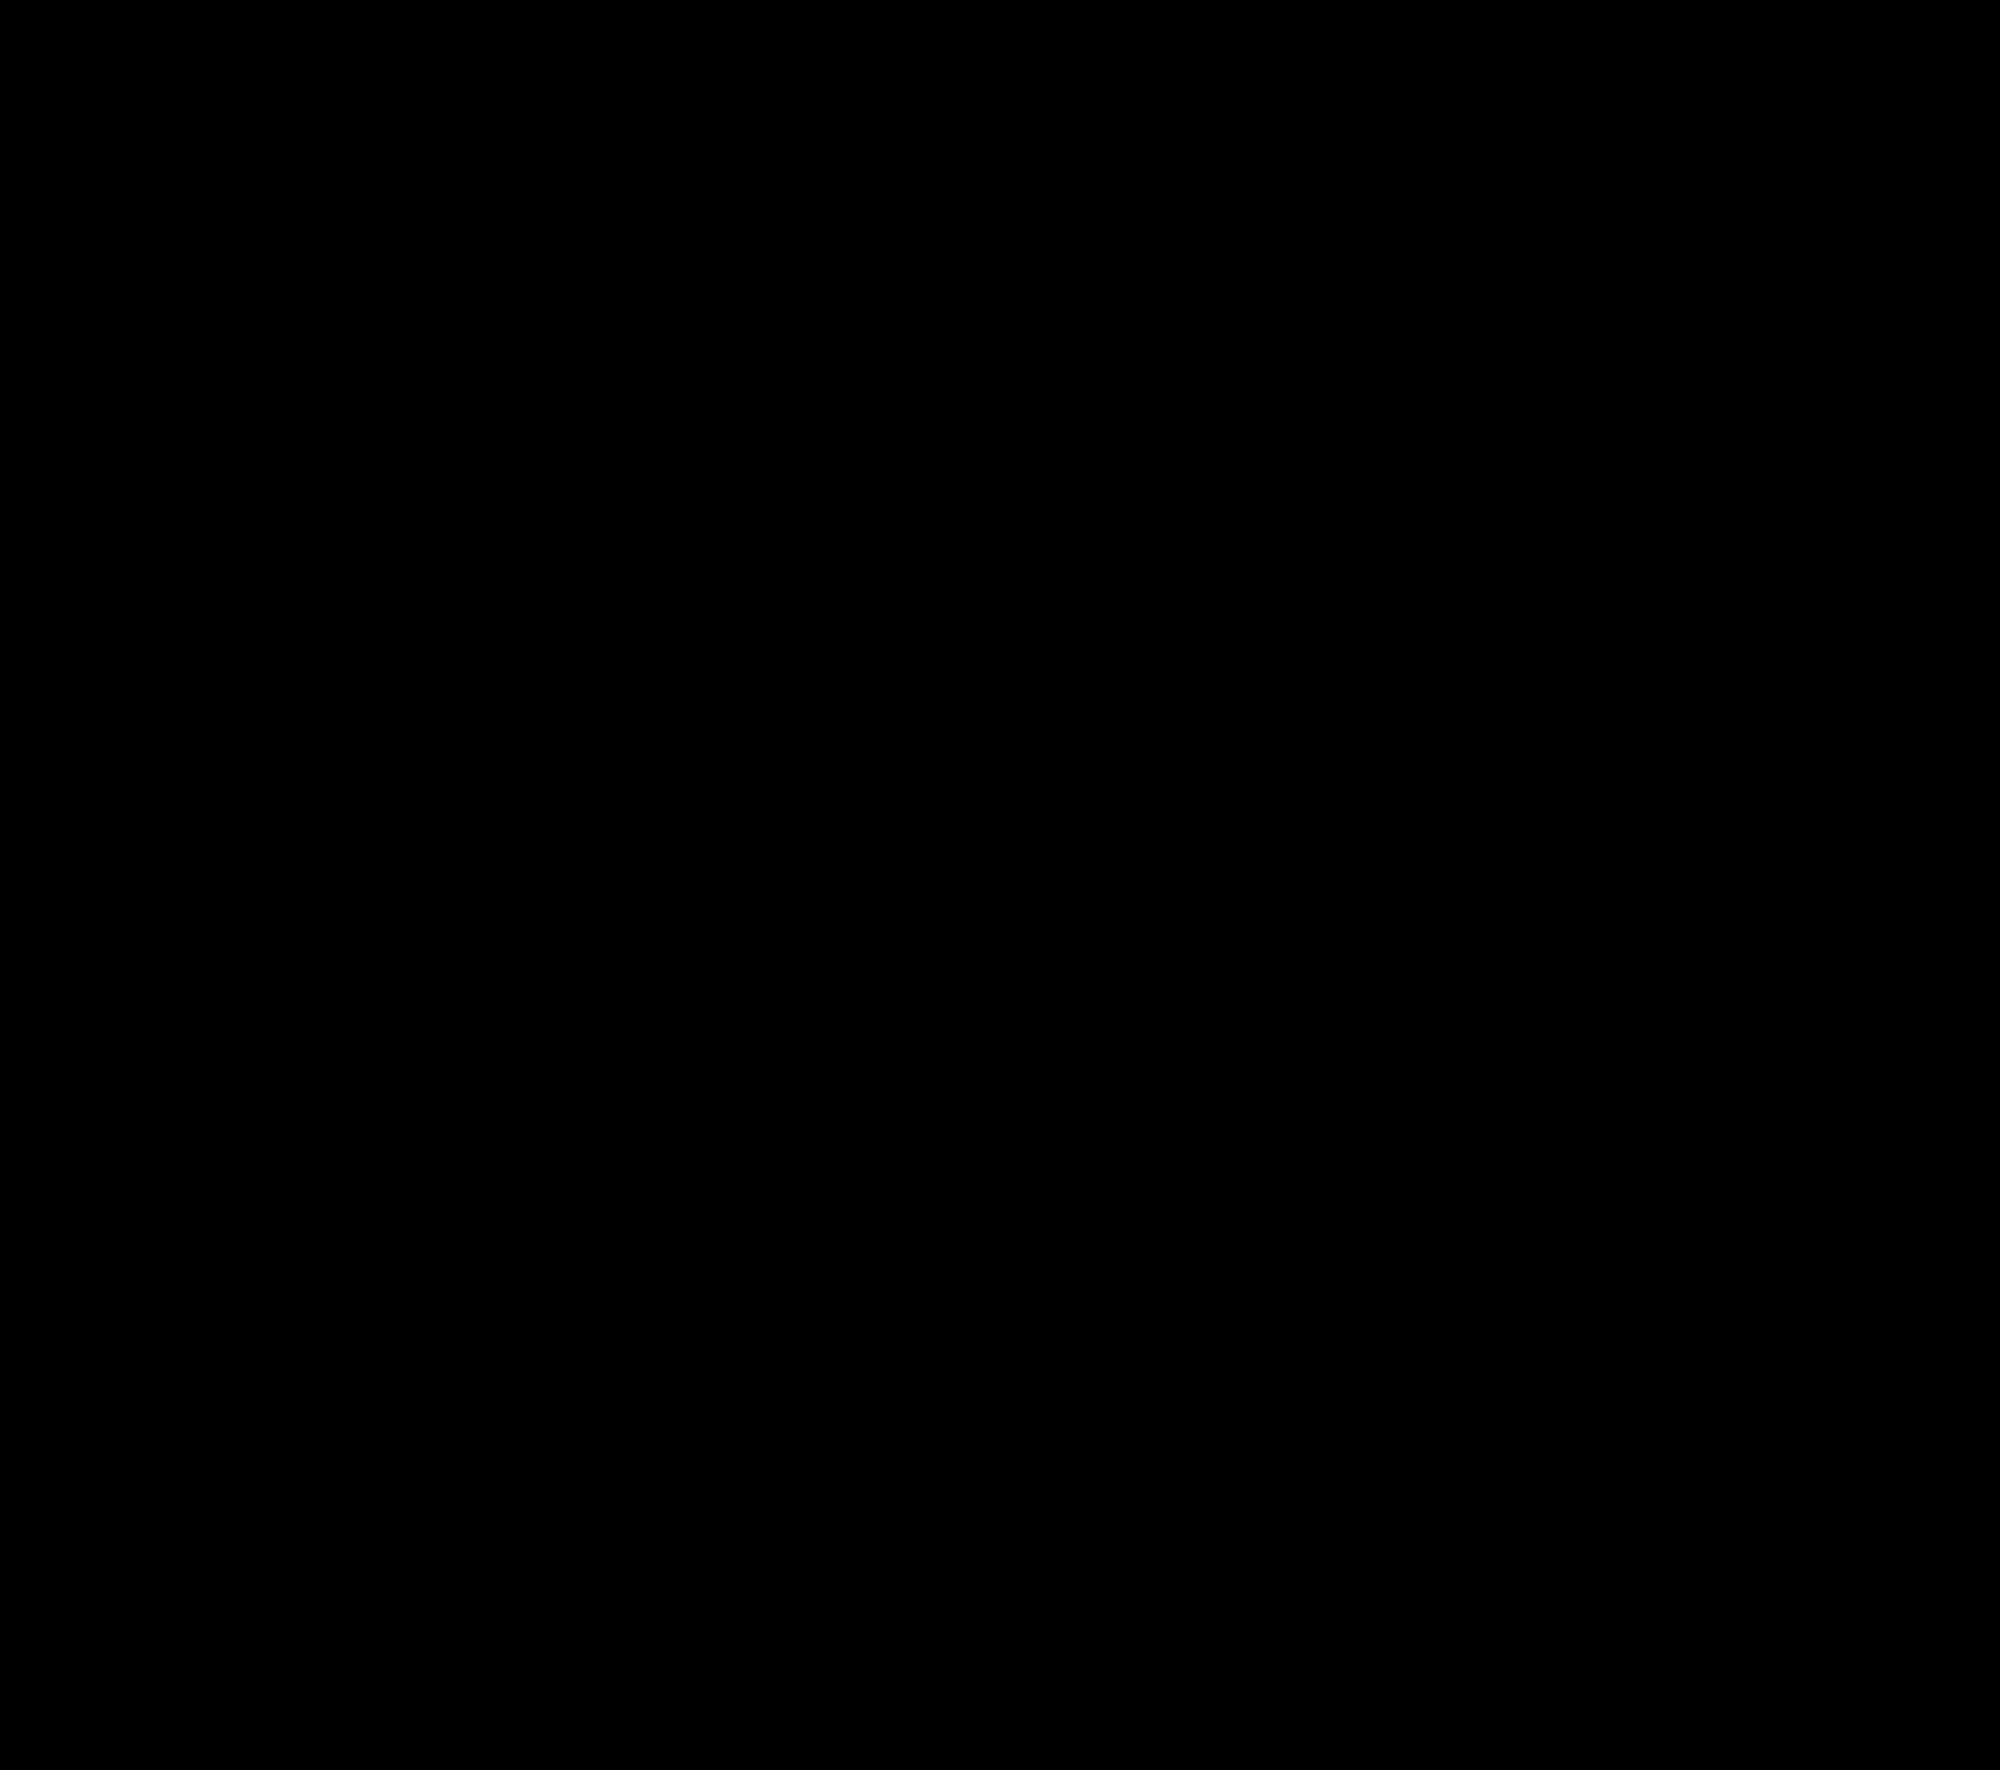 probate lawyer, Michigan probate lawyer, probate estate, probate appeals, probate litigation, trust administration, free, probate